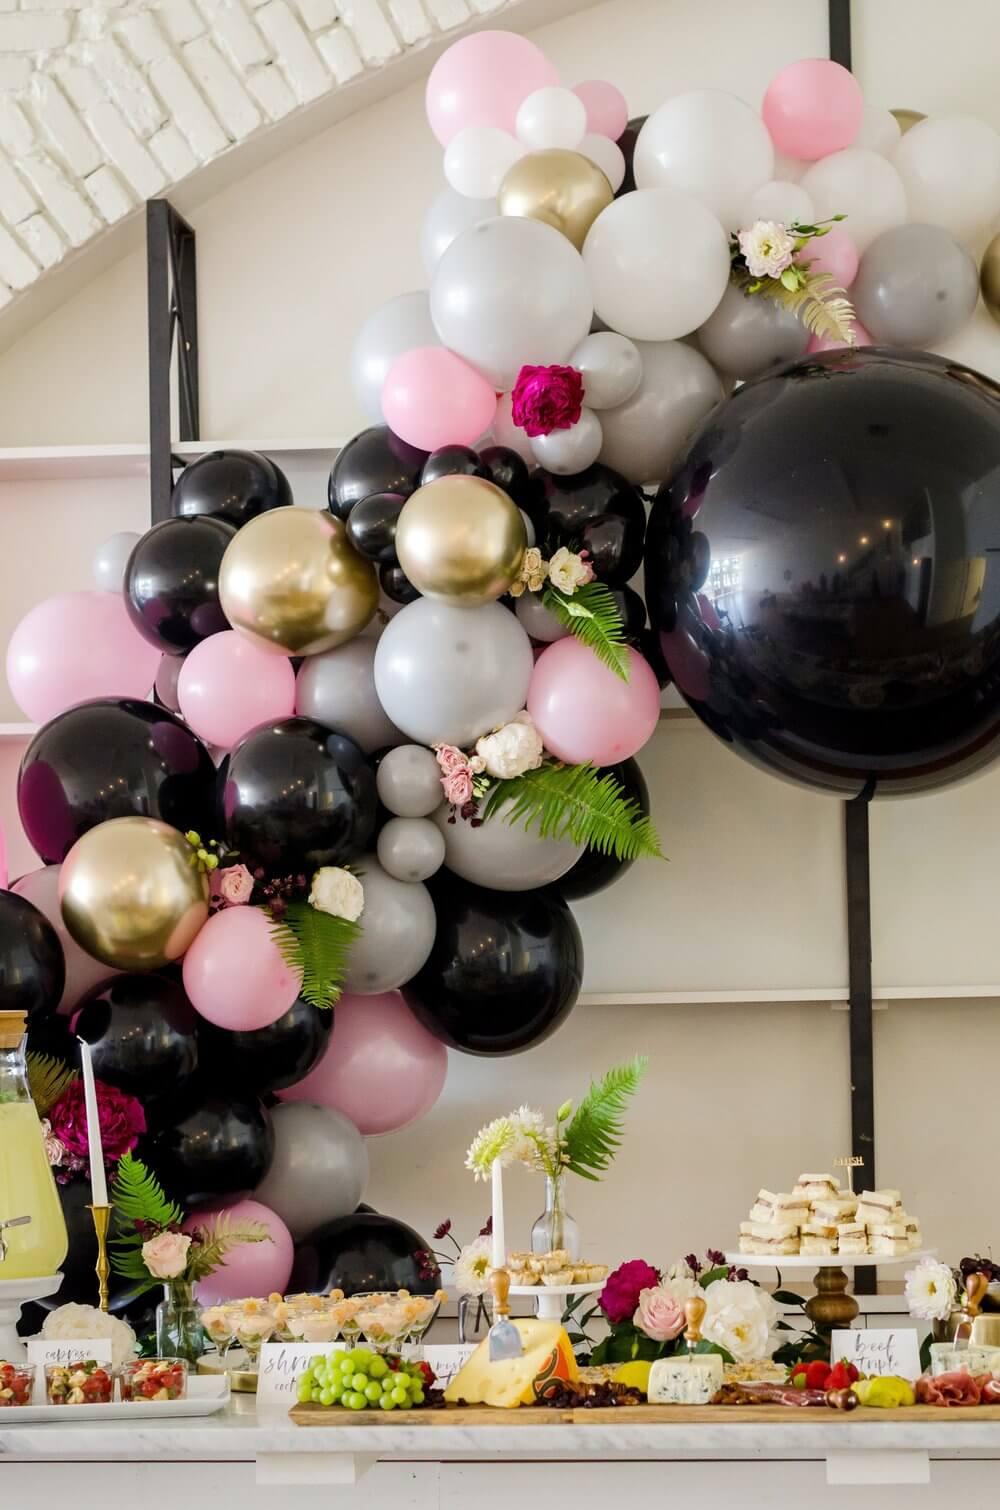 Amazing balloon garland idea